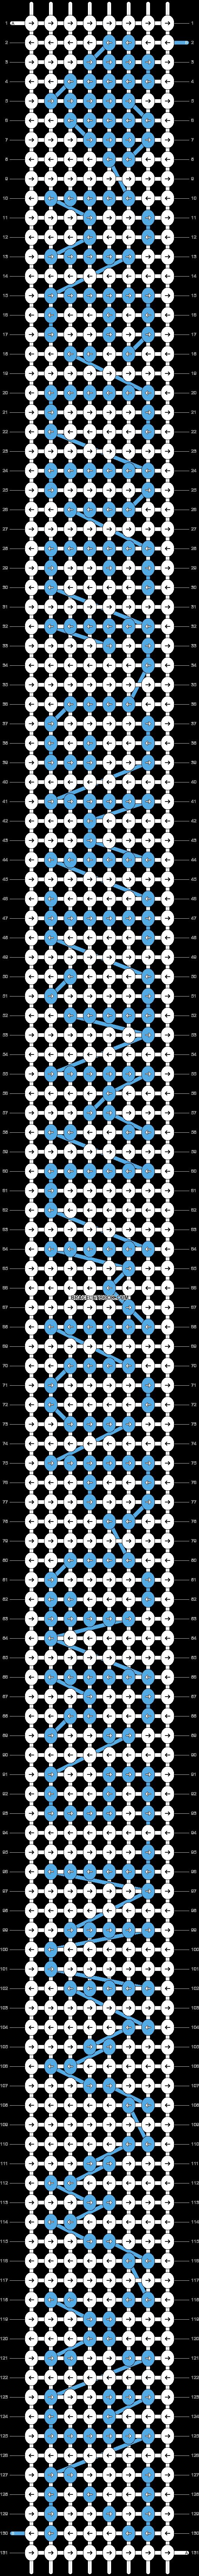 Alpha pattern #3955 pattern